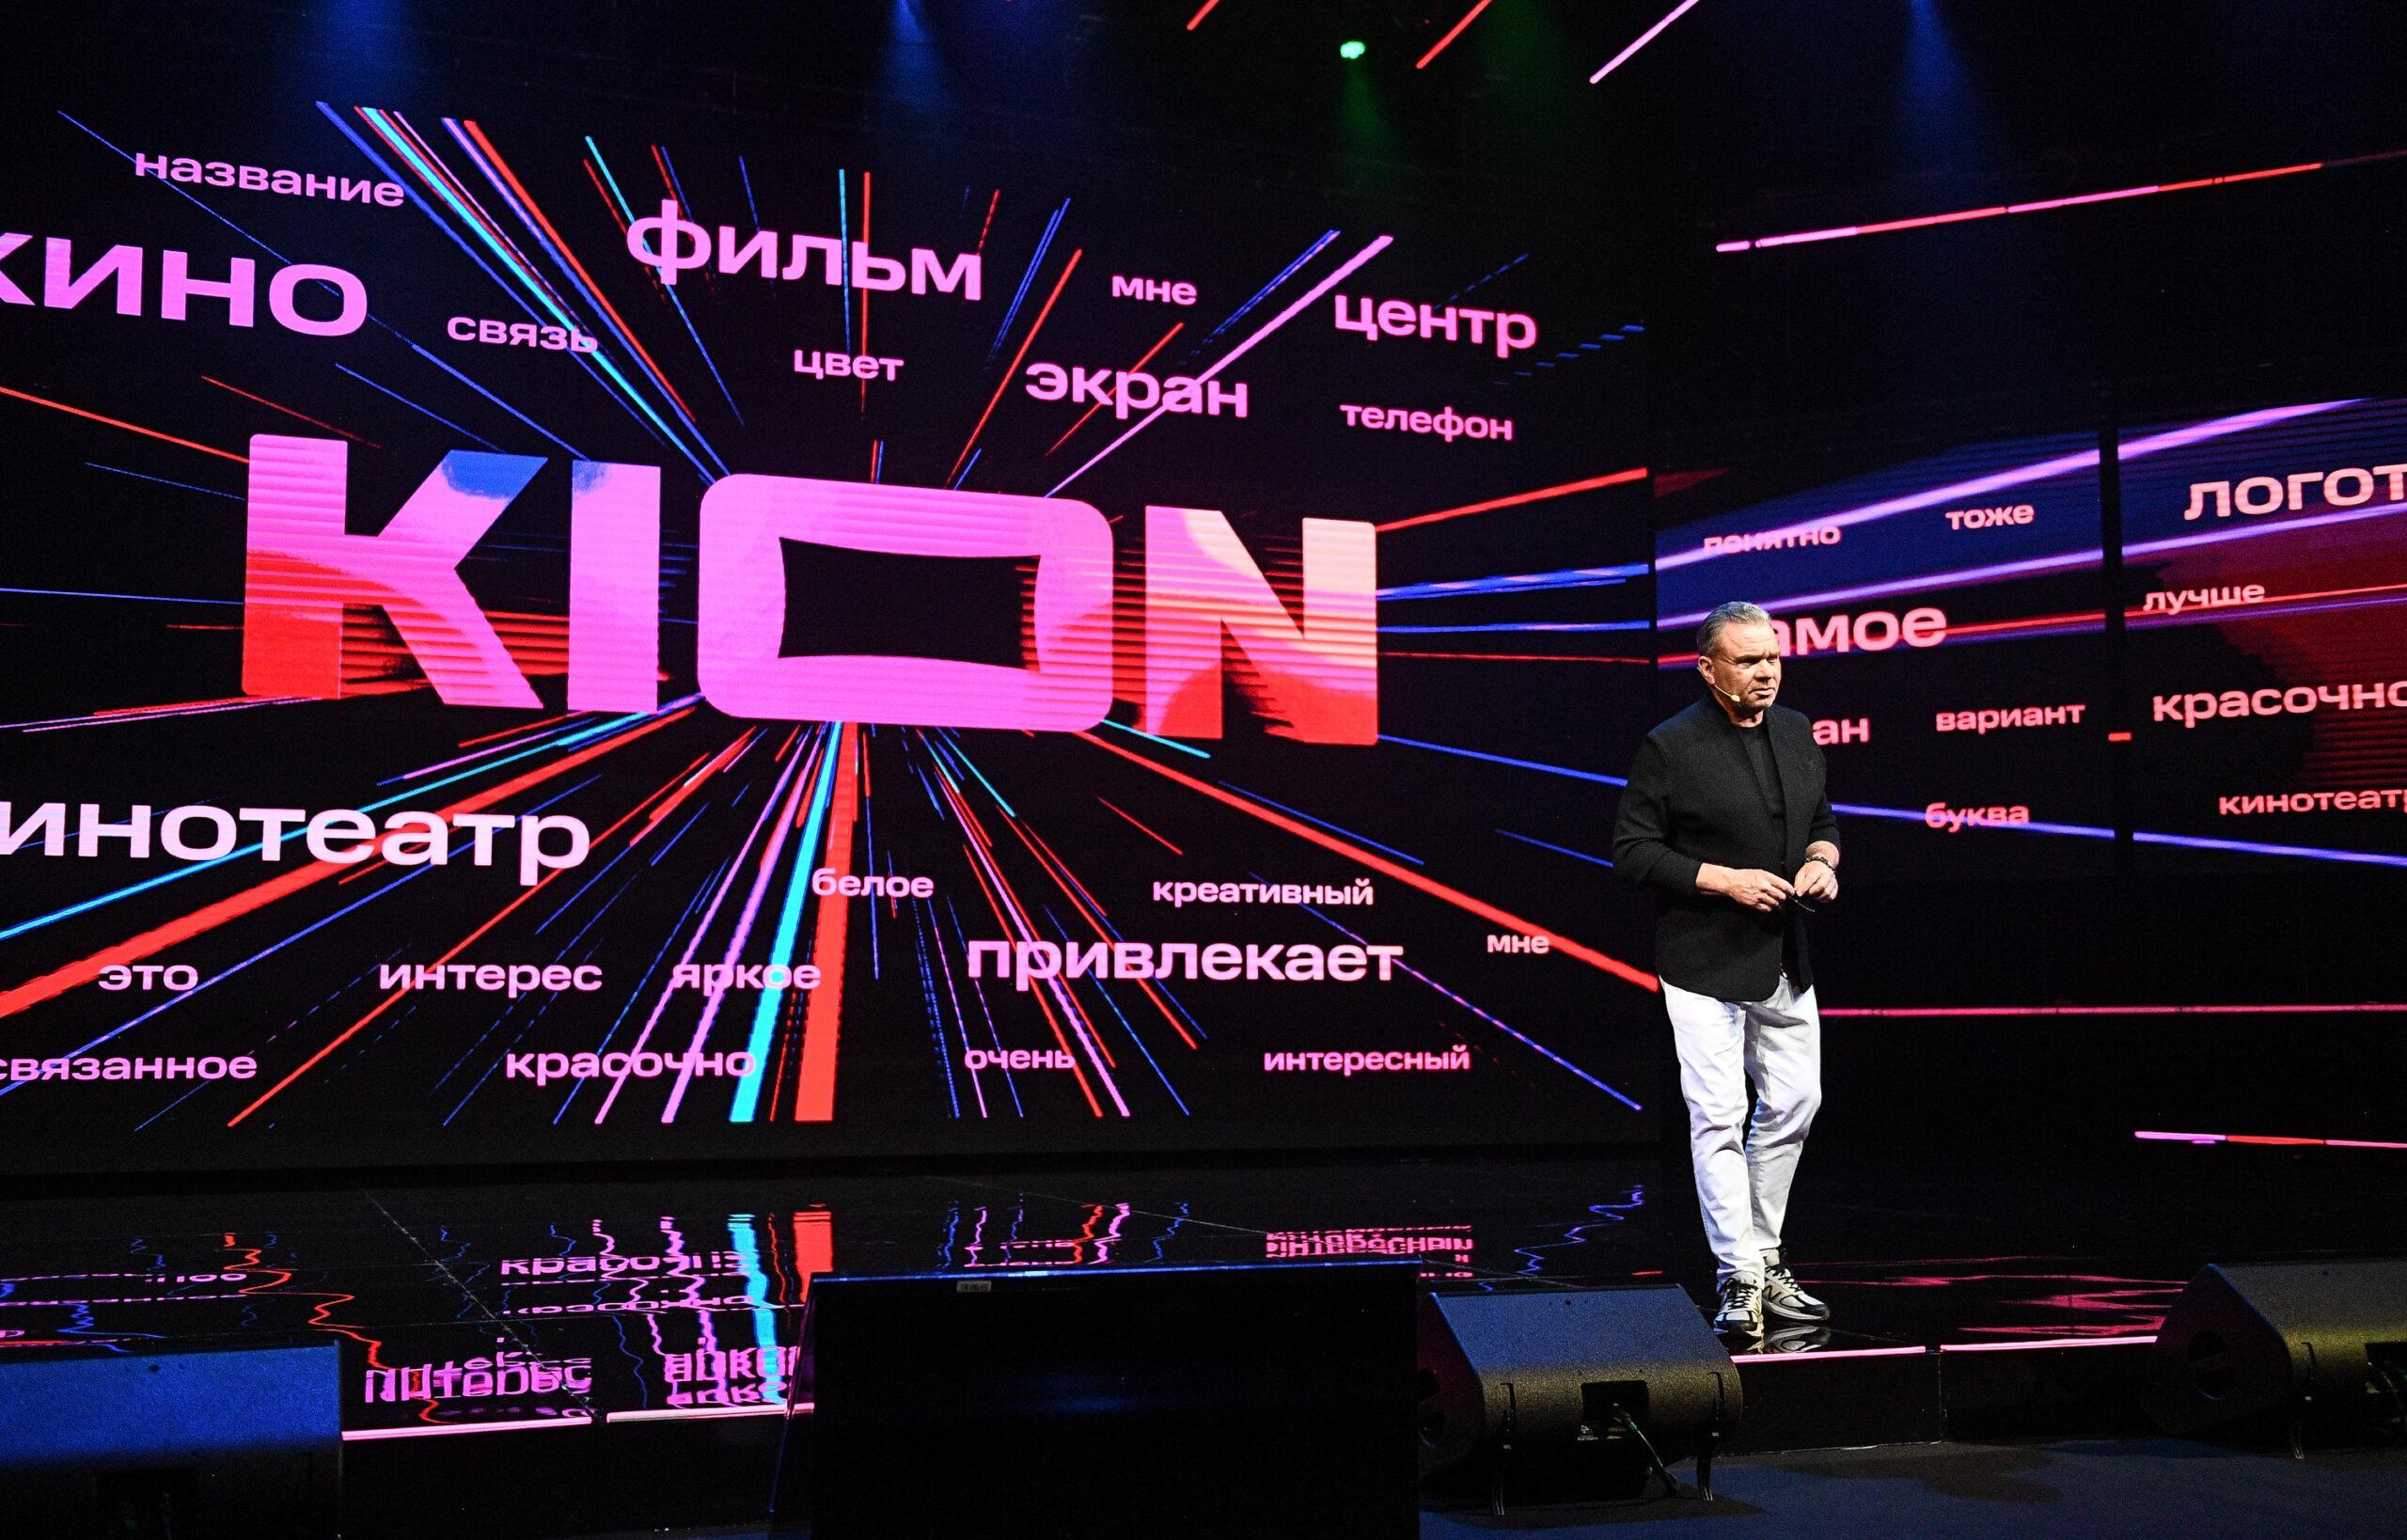 «Дуров», «Сахаров», «Вертинский», «Товарищ майор»: МТС запускает онлайн-кинотеатр KION